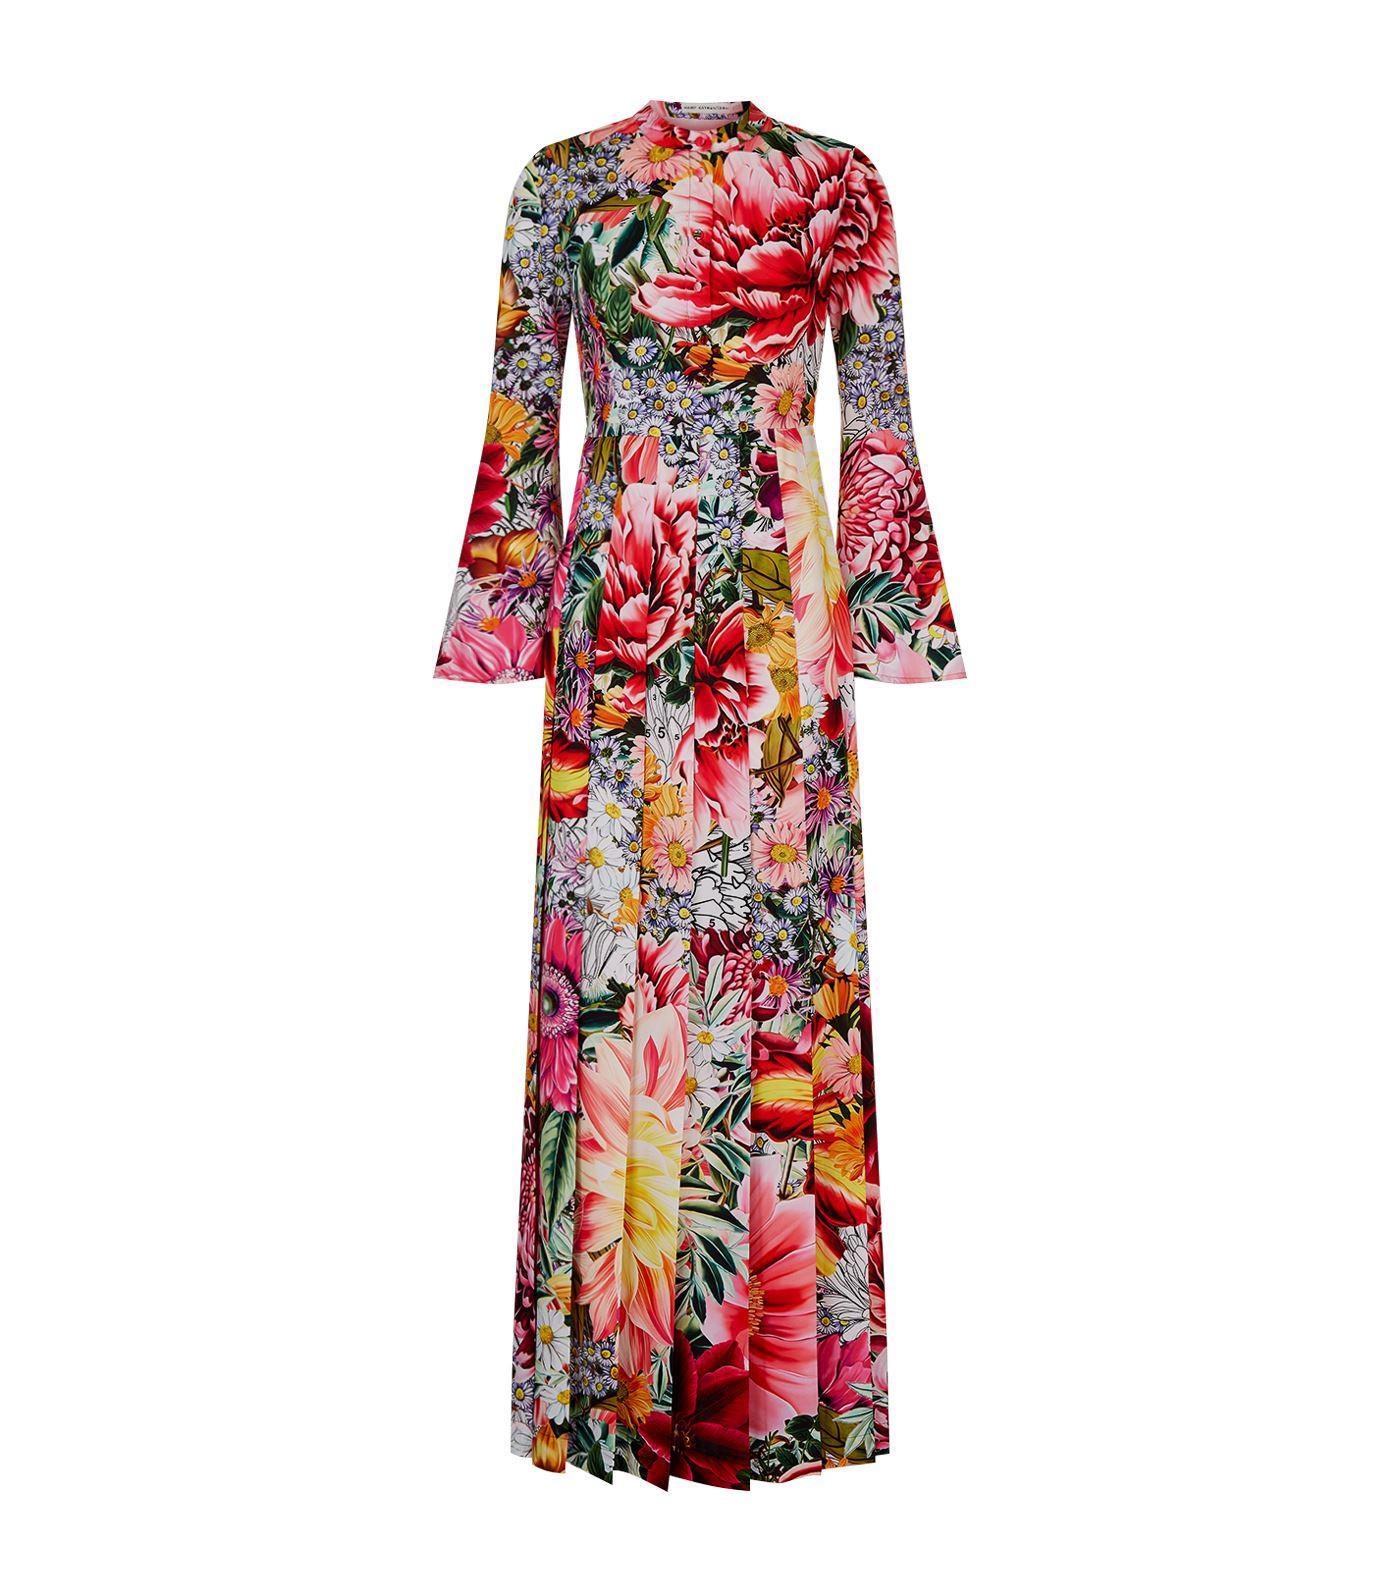 Desmine Pleated Floral-print Crepe De Chine Gown - Fuchsia Mary Katrantzou EEOwRg6G1W